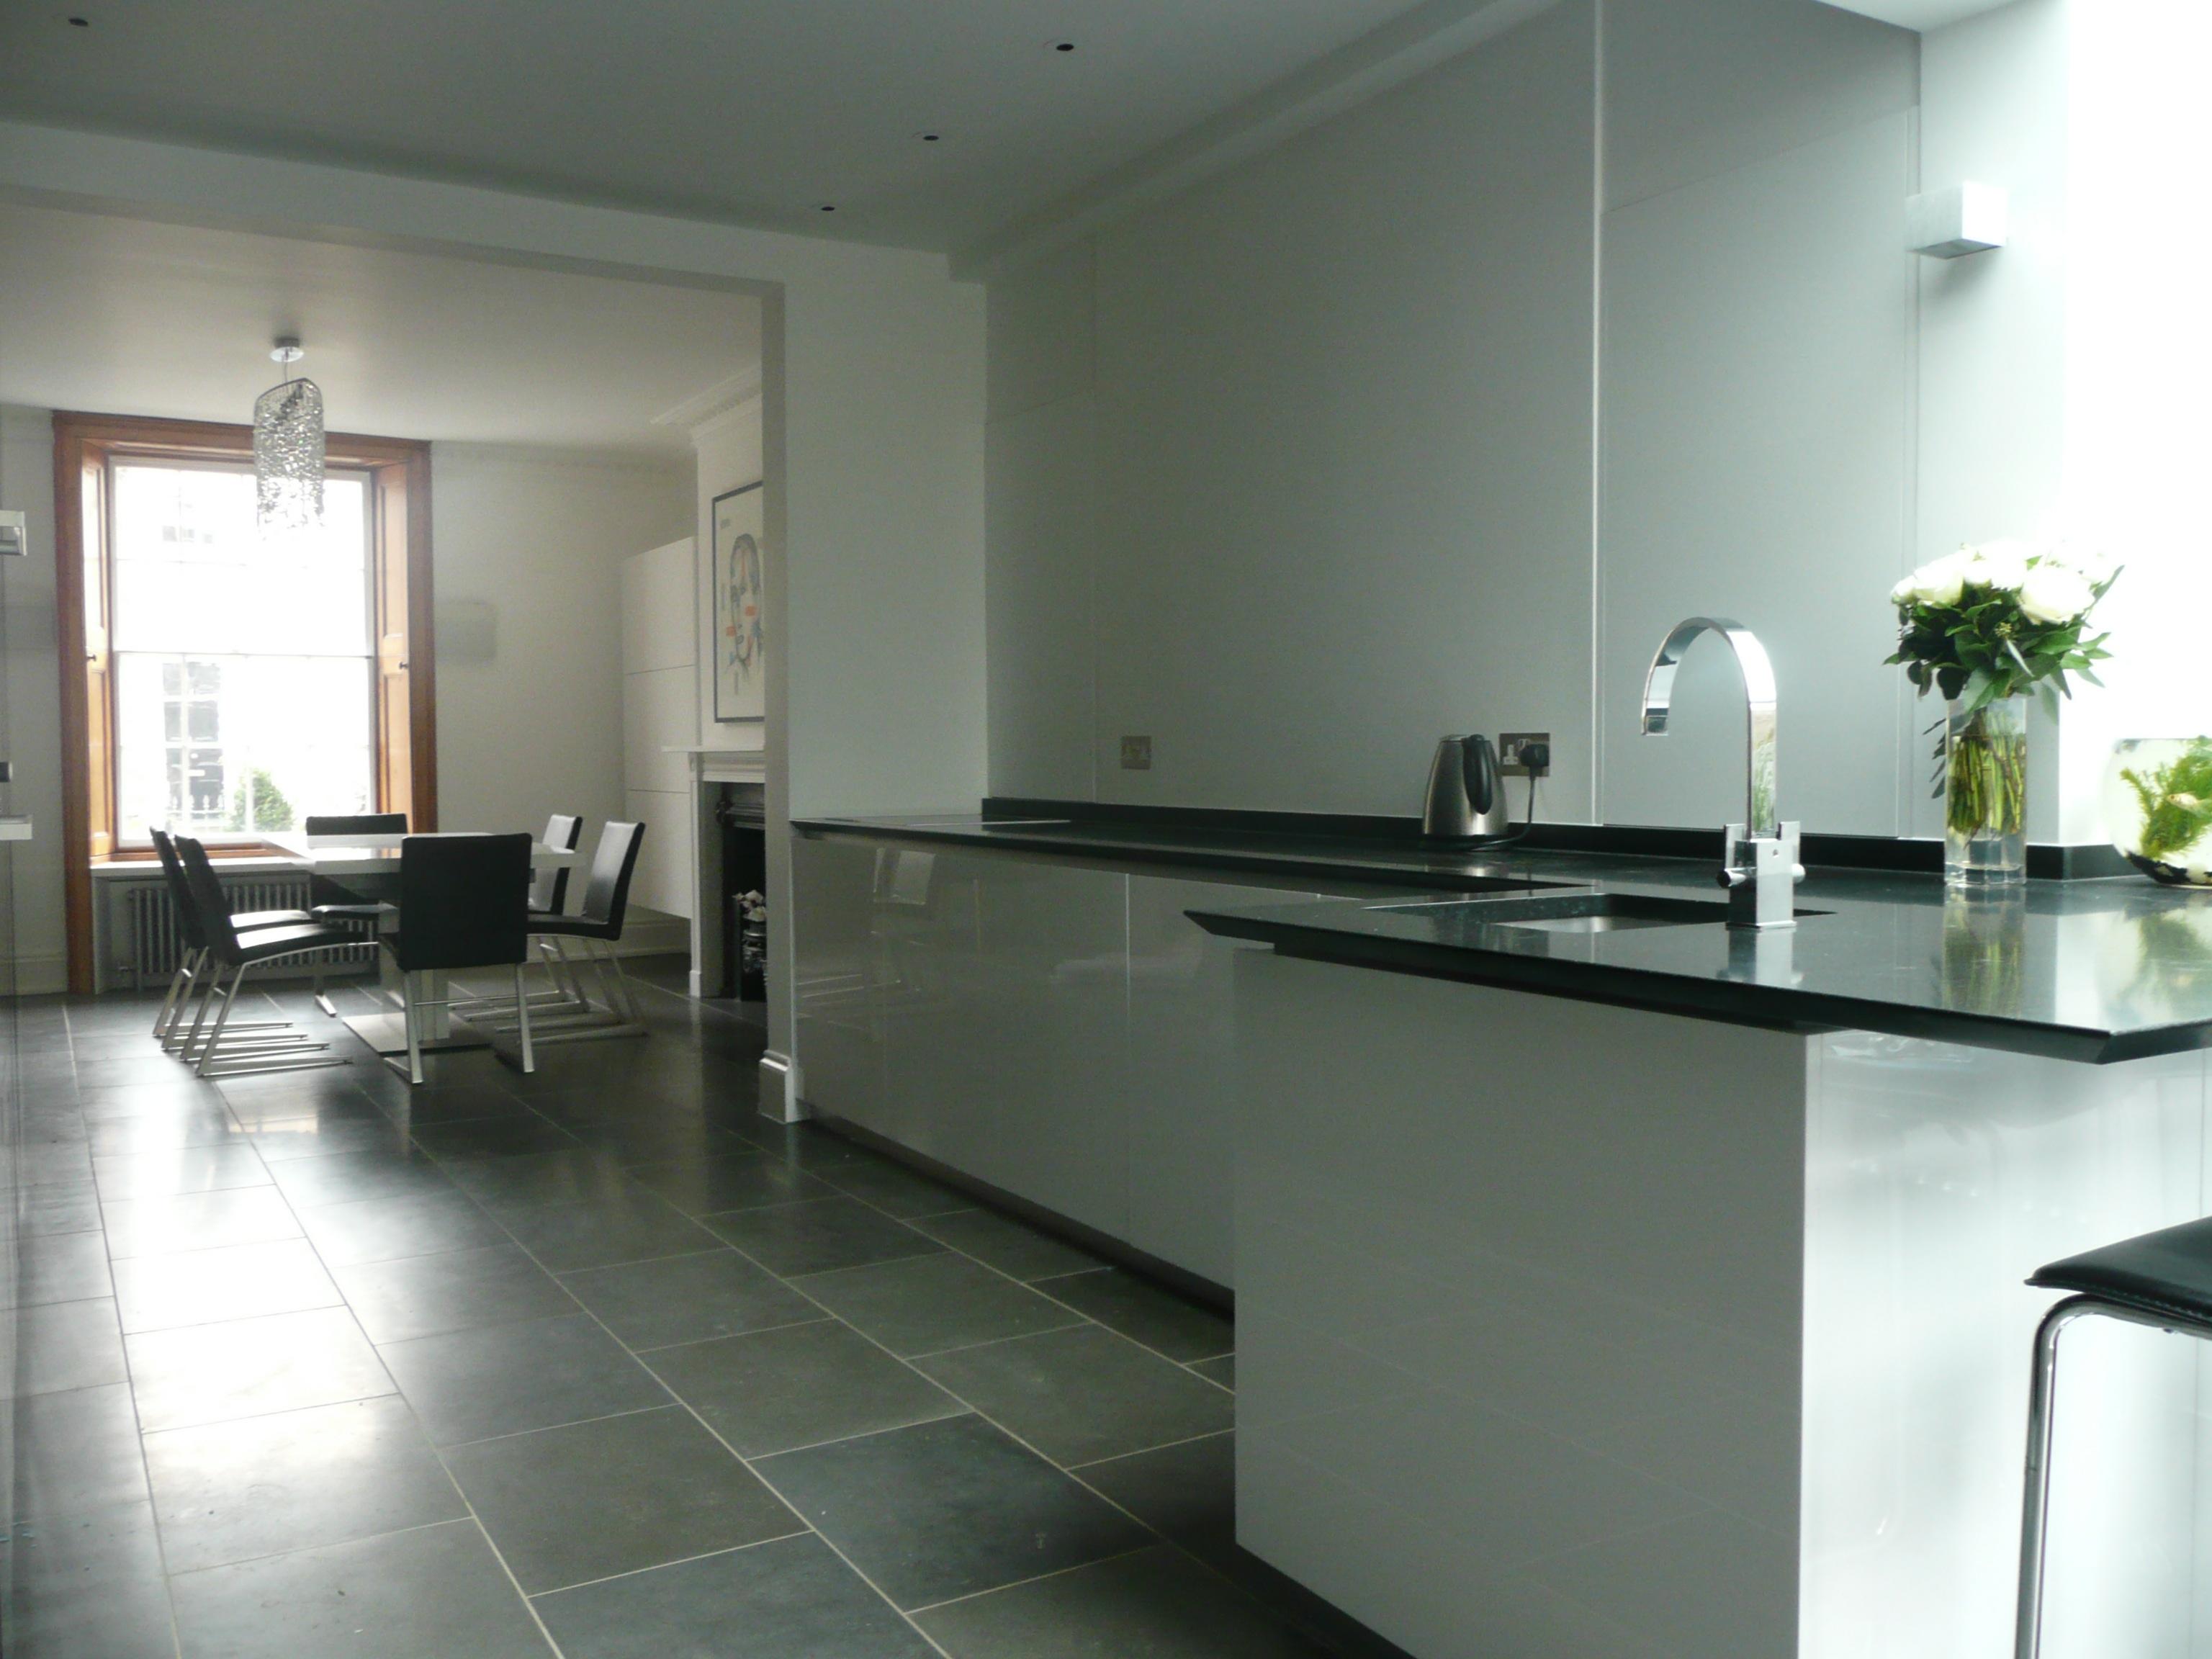 High gloss doors in a sleek minimal kitchen